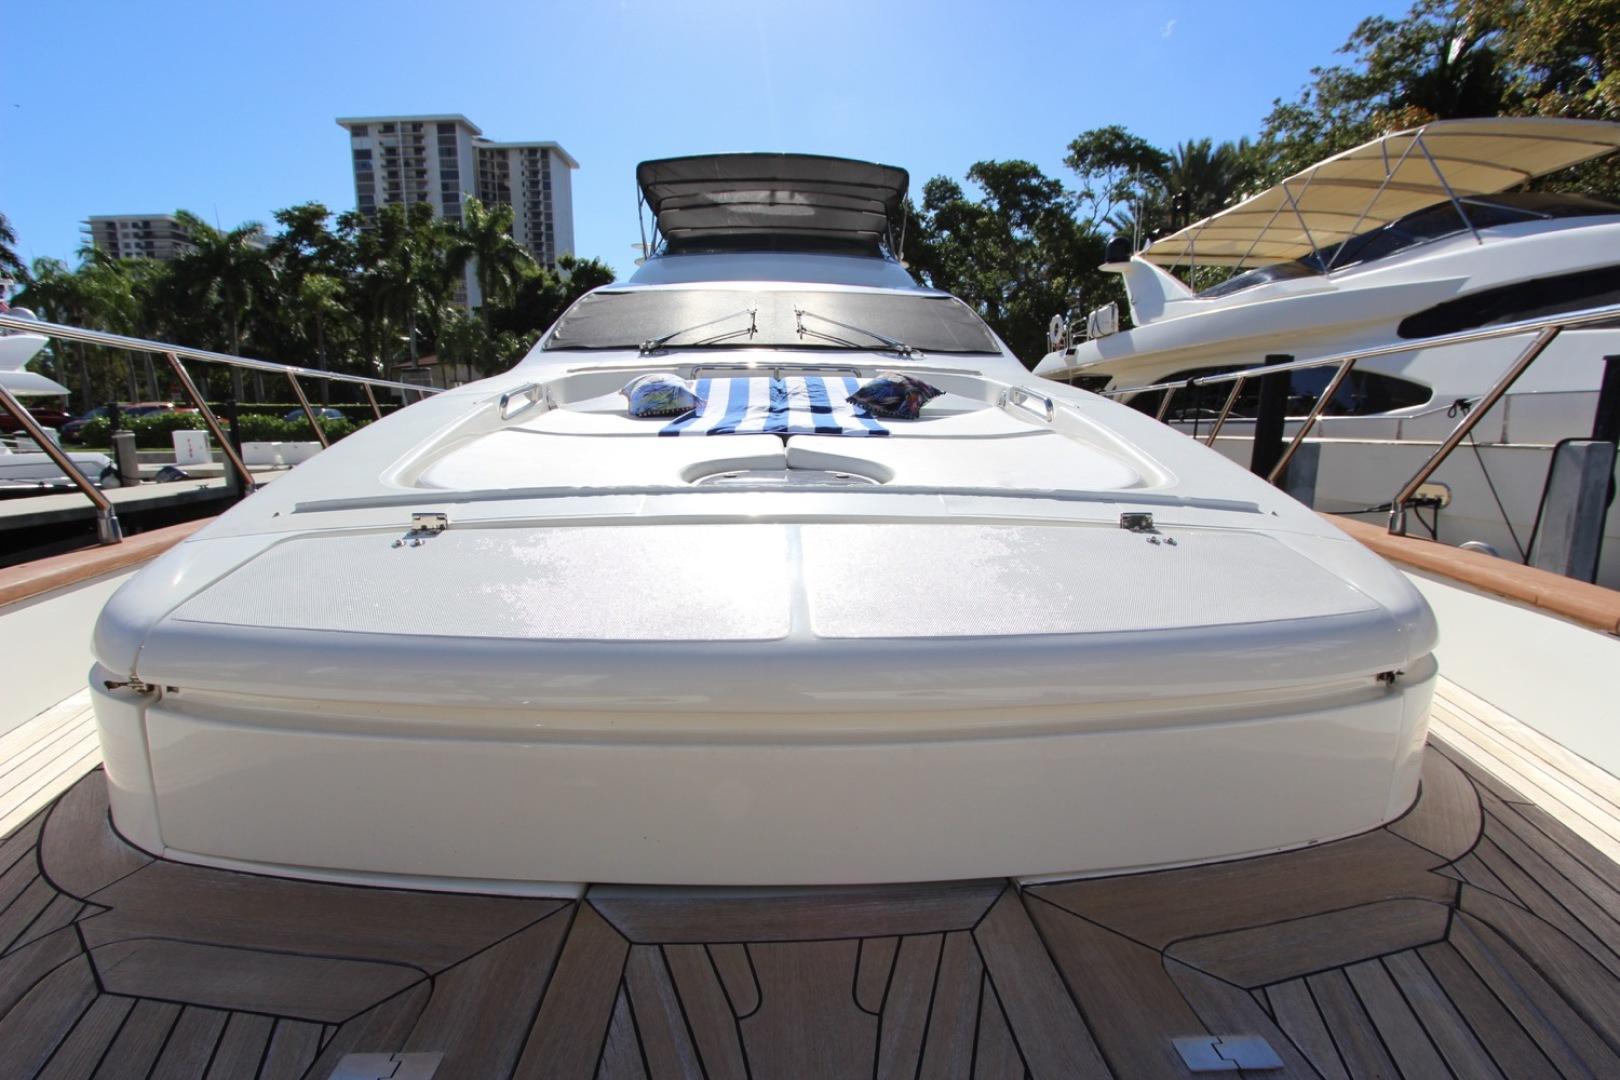 Azimut-2008 Azimut 80 2008-PURA VIDA Aventura-Florida-United States-2008 Azimut 80 Flybride for sale in Aventura -1145105 | Thumbnail